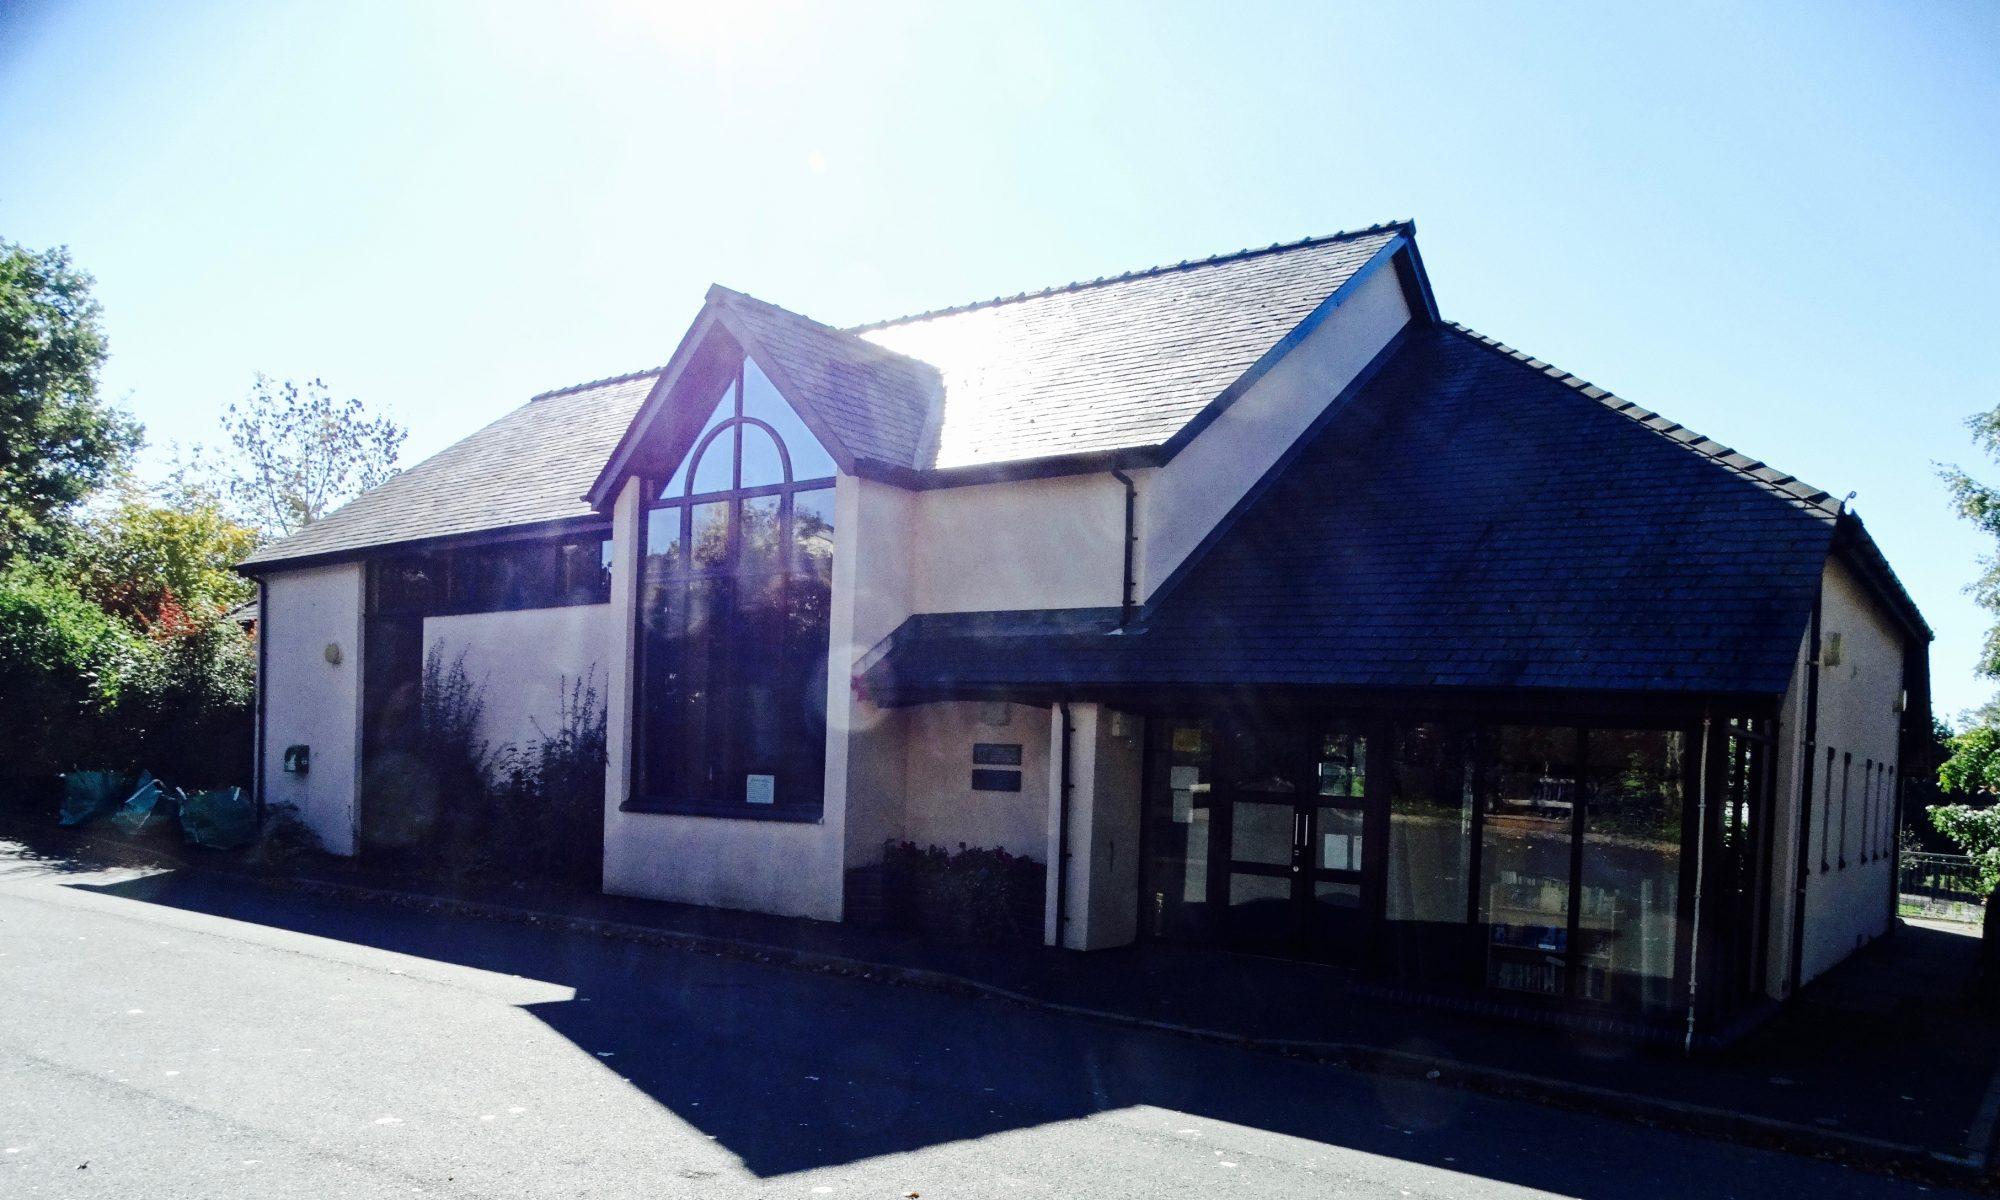 Llangors Community Centre Canolfan Cymuned Llangors